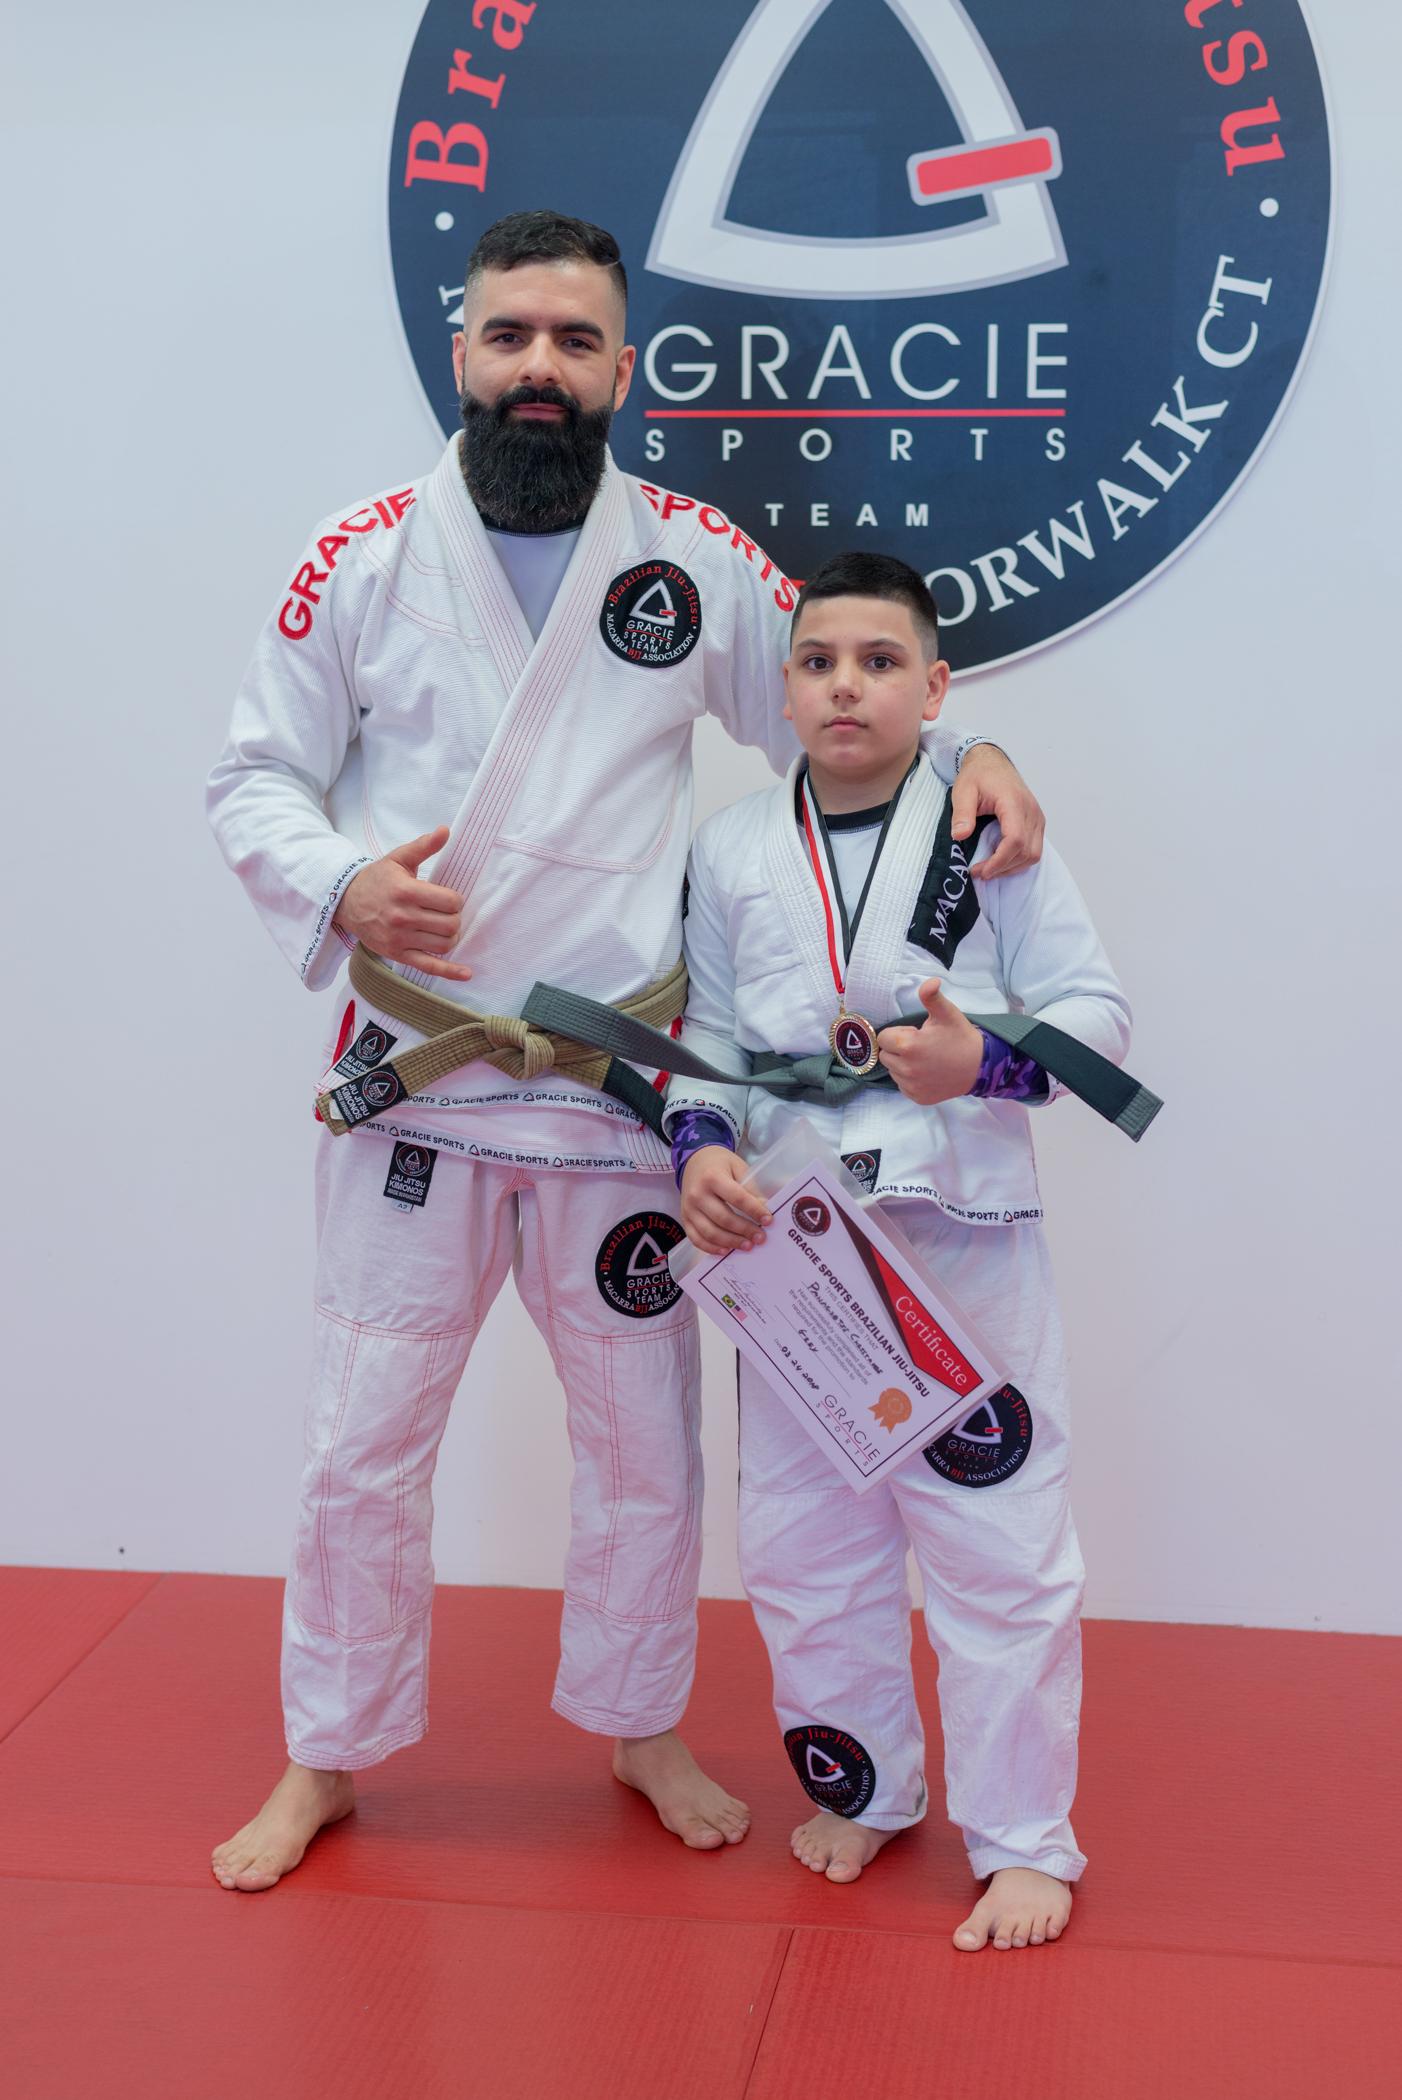 Gracie-Sports-Kids-166.jpg